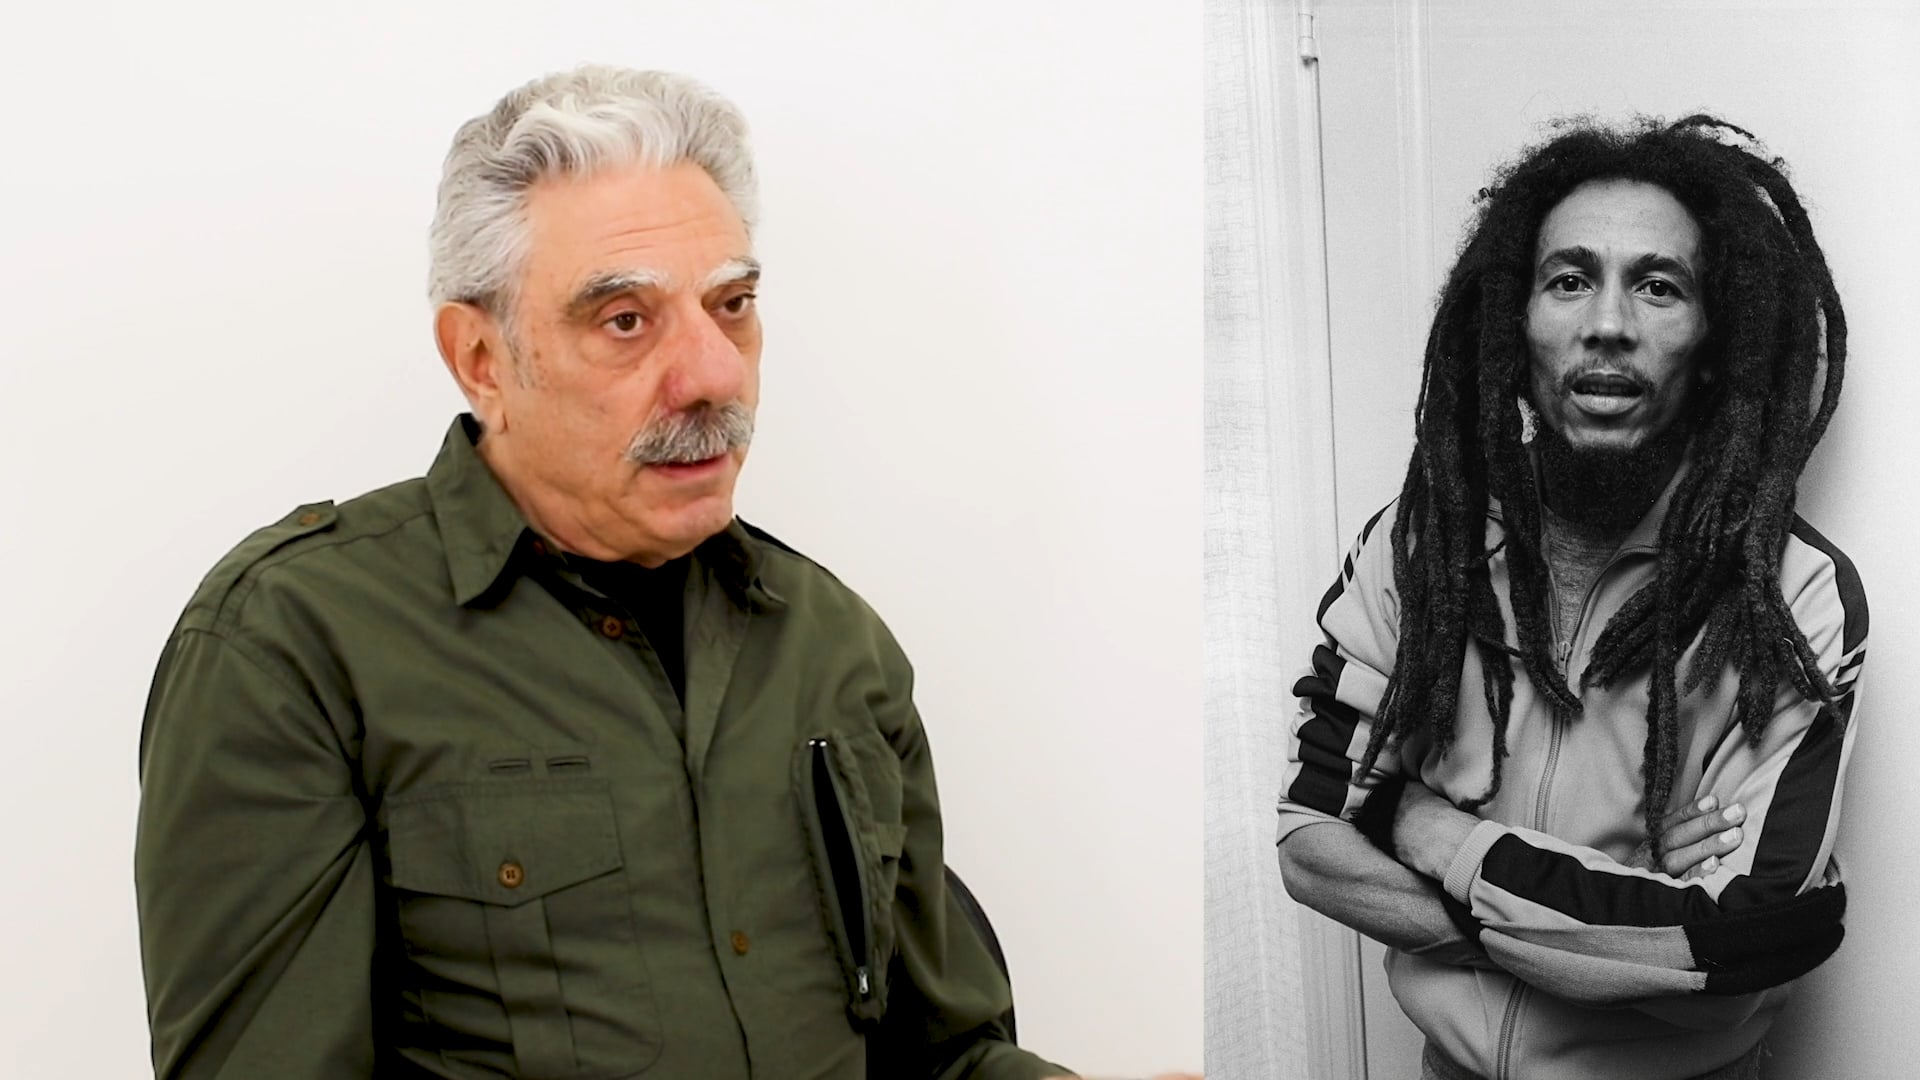 Photographer Allan Tannenbaum discusses Bob Marley